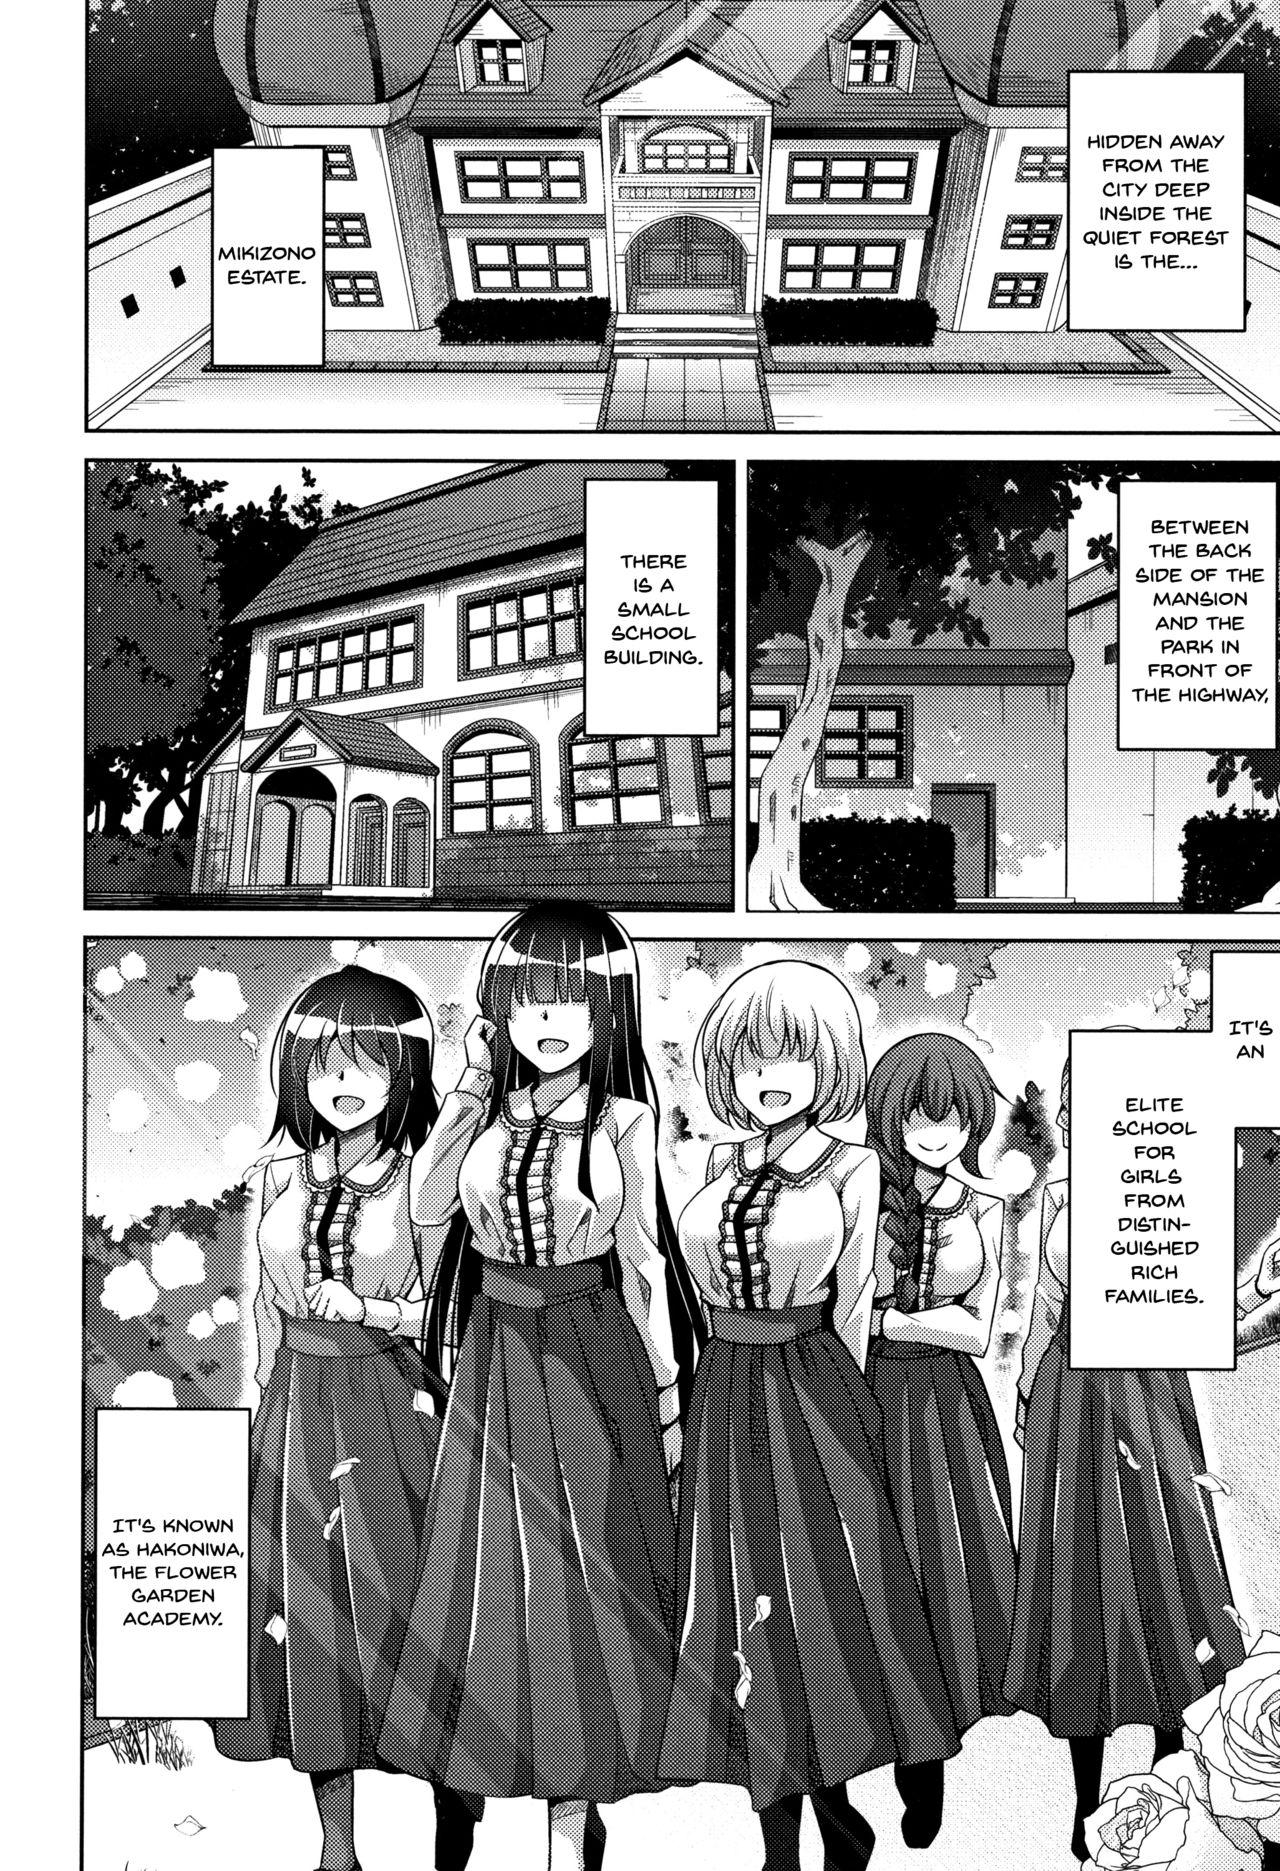 [Nikusoukyuu.] Hakoniwa ni Saku Mesu no Hana | women like flowers growing from the-garden Ch. 0-9 [English] {Doujins.com} 8